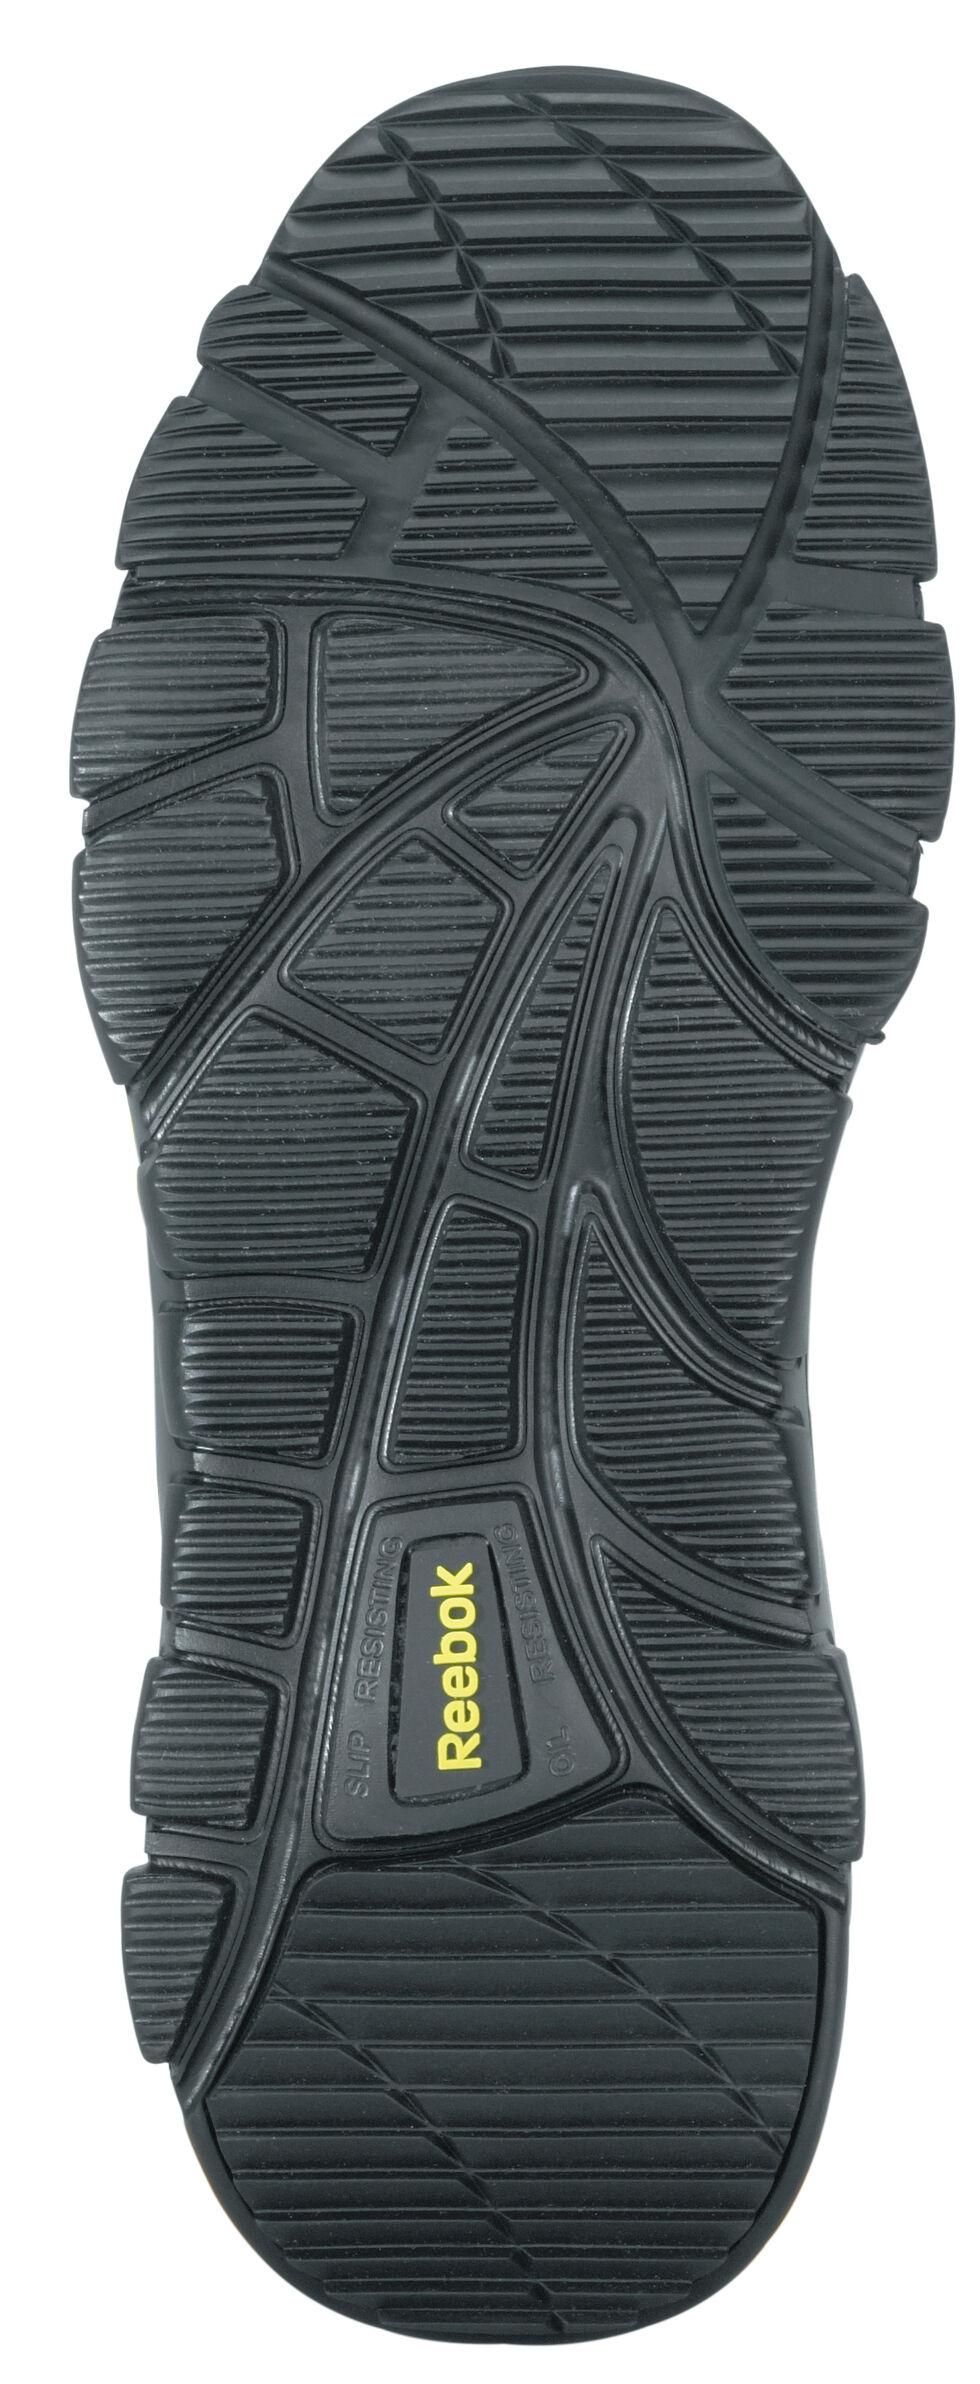 Reebok Men's Arion Oxford Work Shoes - Composite Toe, Black, hi-res